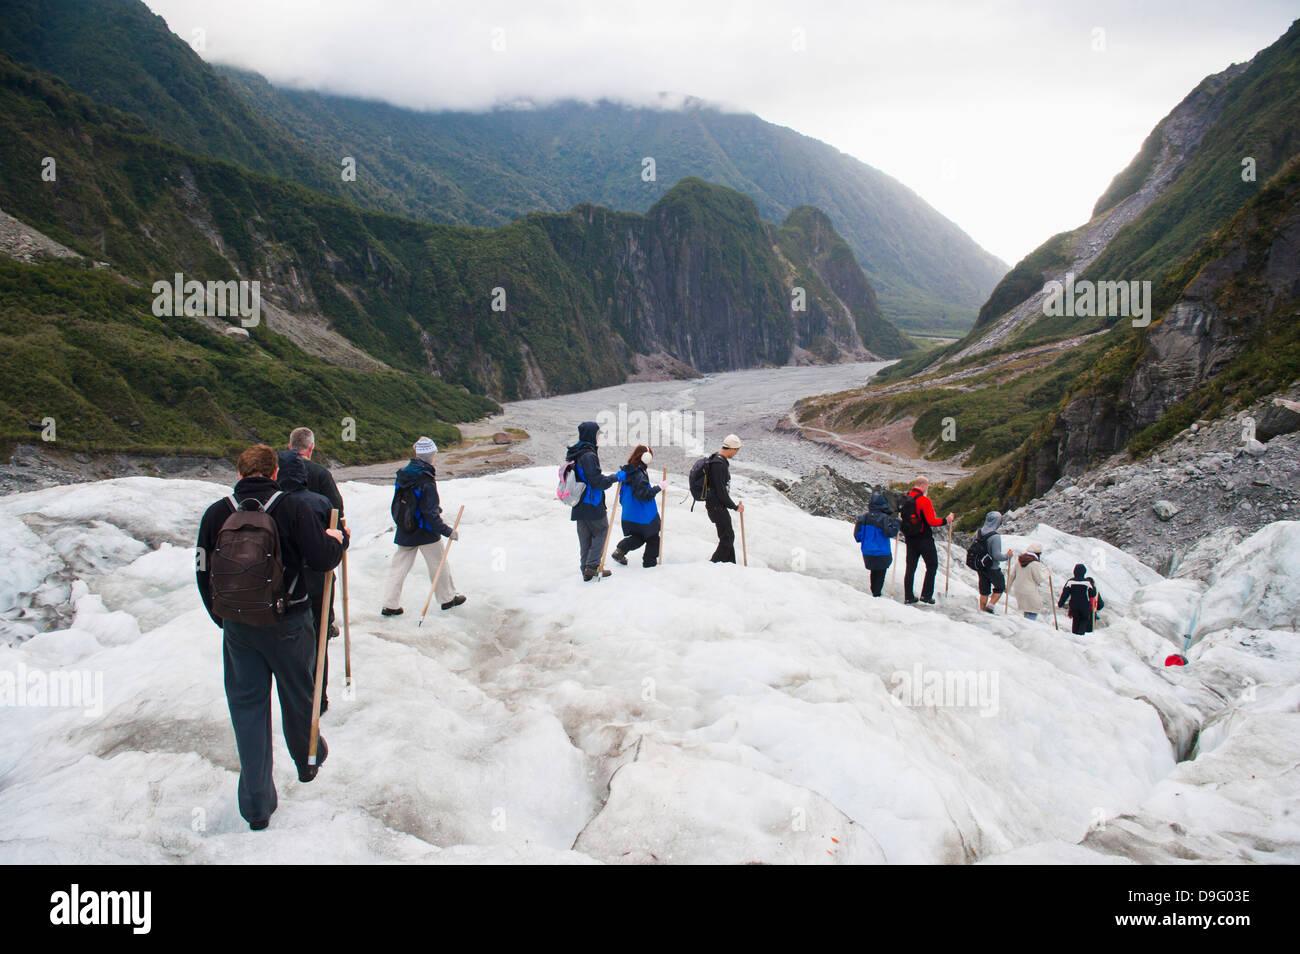 Tourists walking on Fox Glacier, Westland National Park, UNESCO World Heritage Site, South Island, New Zealand - Stock Image